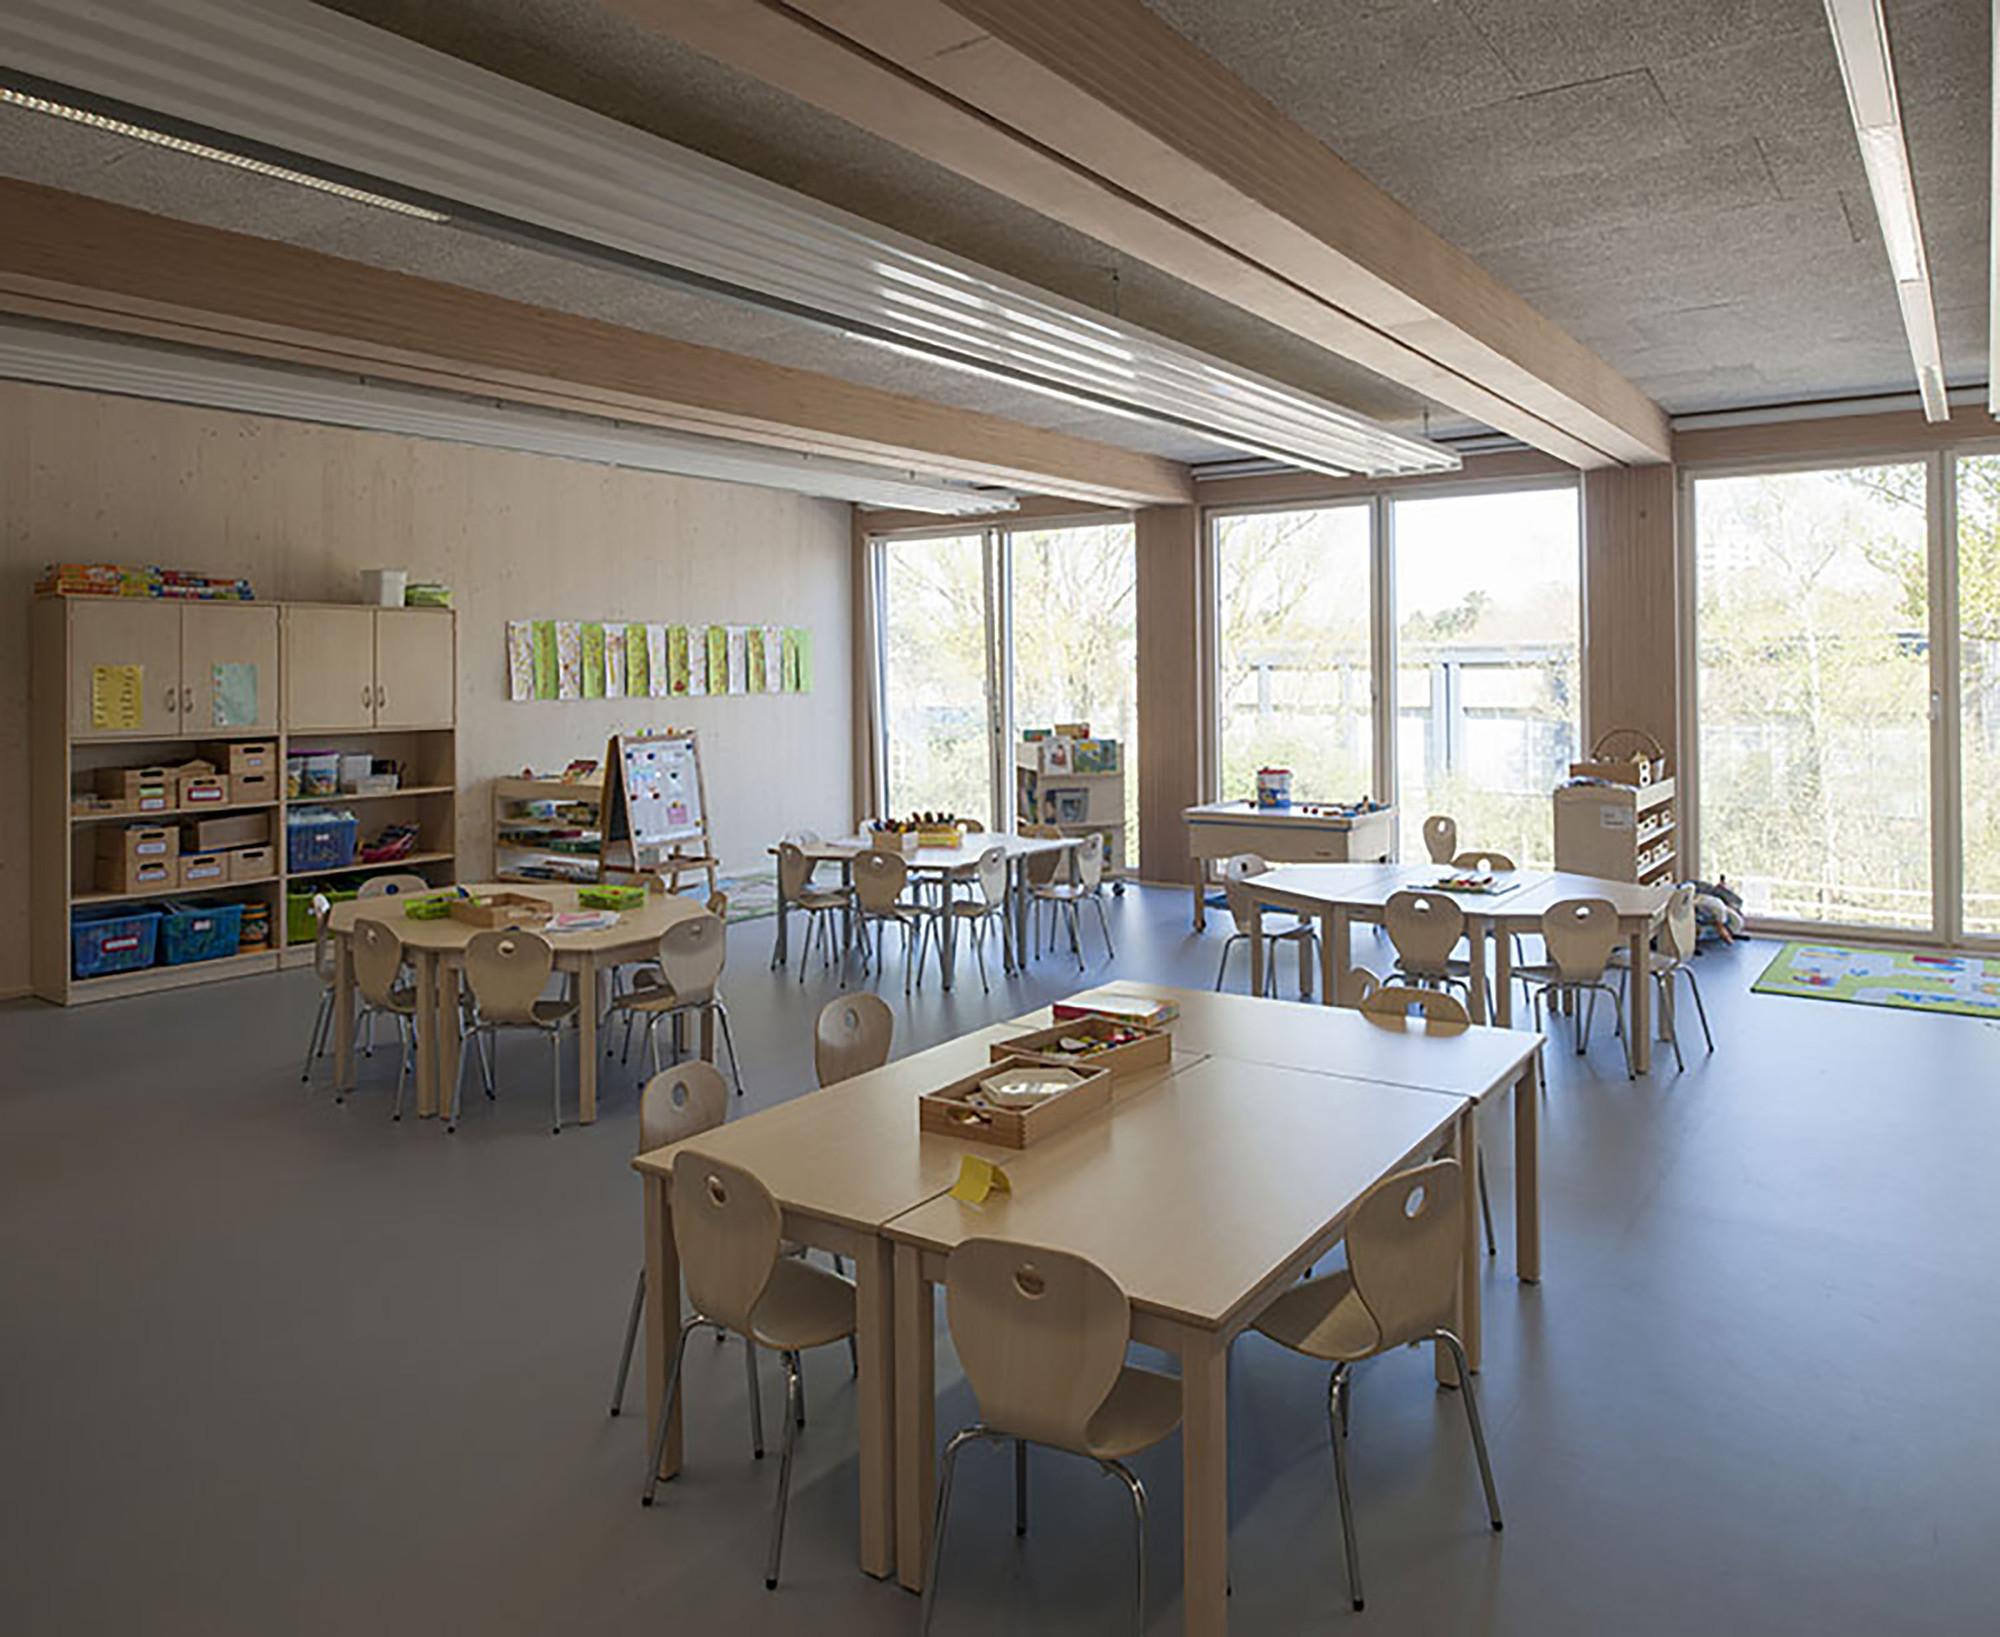 European School in Frankfurt / NKBAK